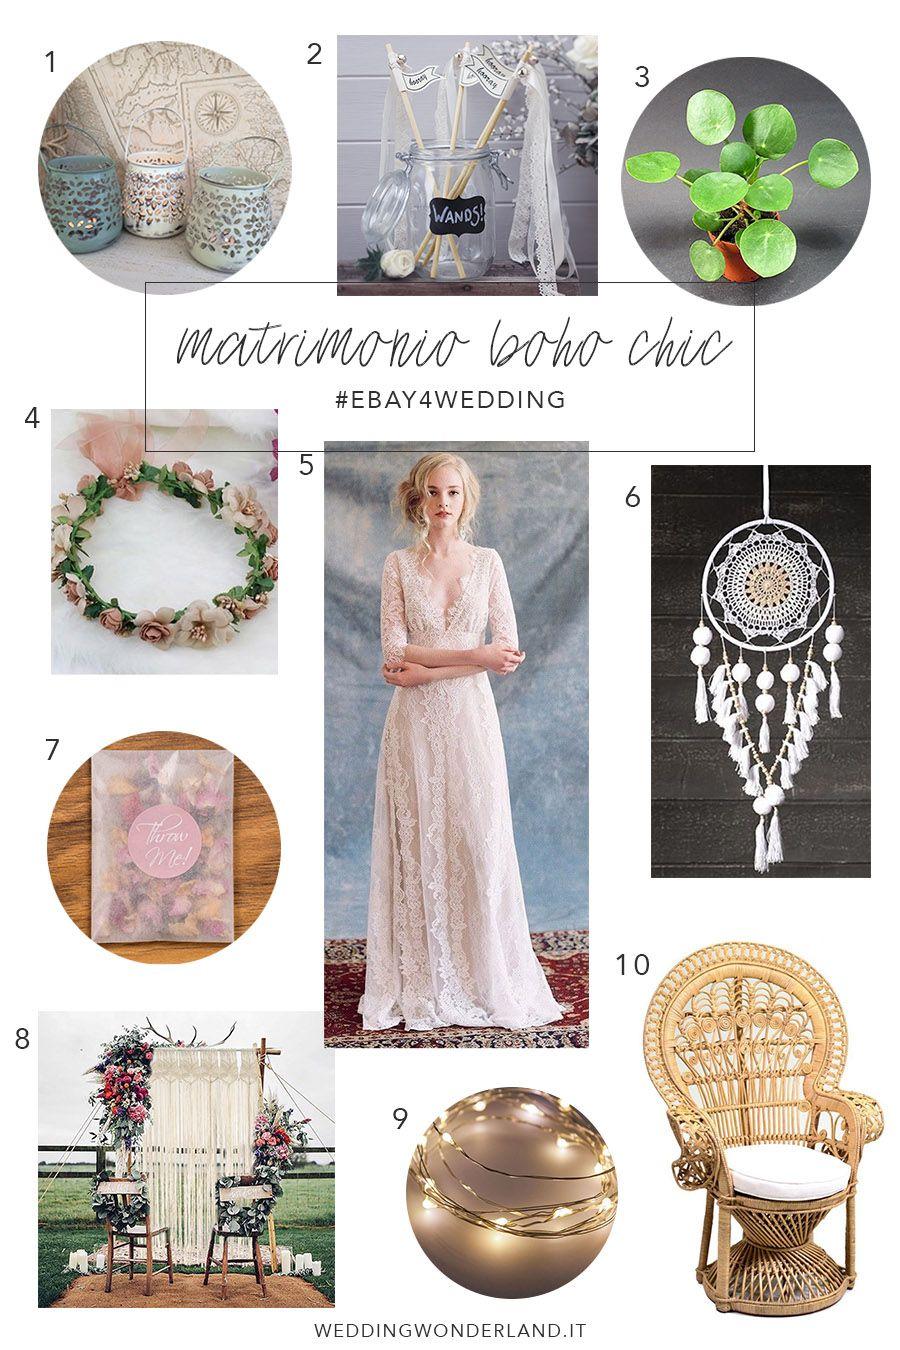 3 Stili 3 Matrimoni Ecco Come Organizzare Un Matrimonio Con Ebay Wedding Wonderland Matrimonio Matrimonio Boho Stili